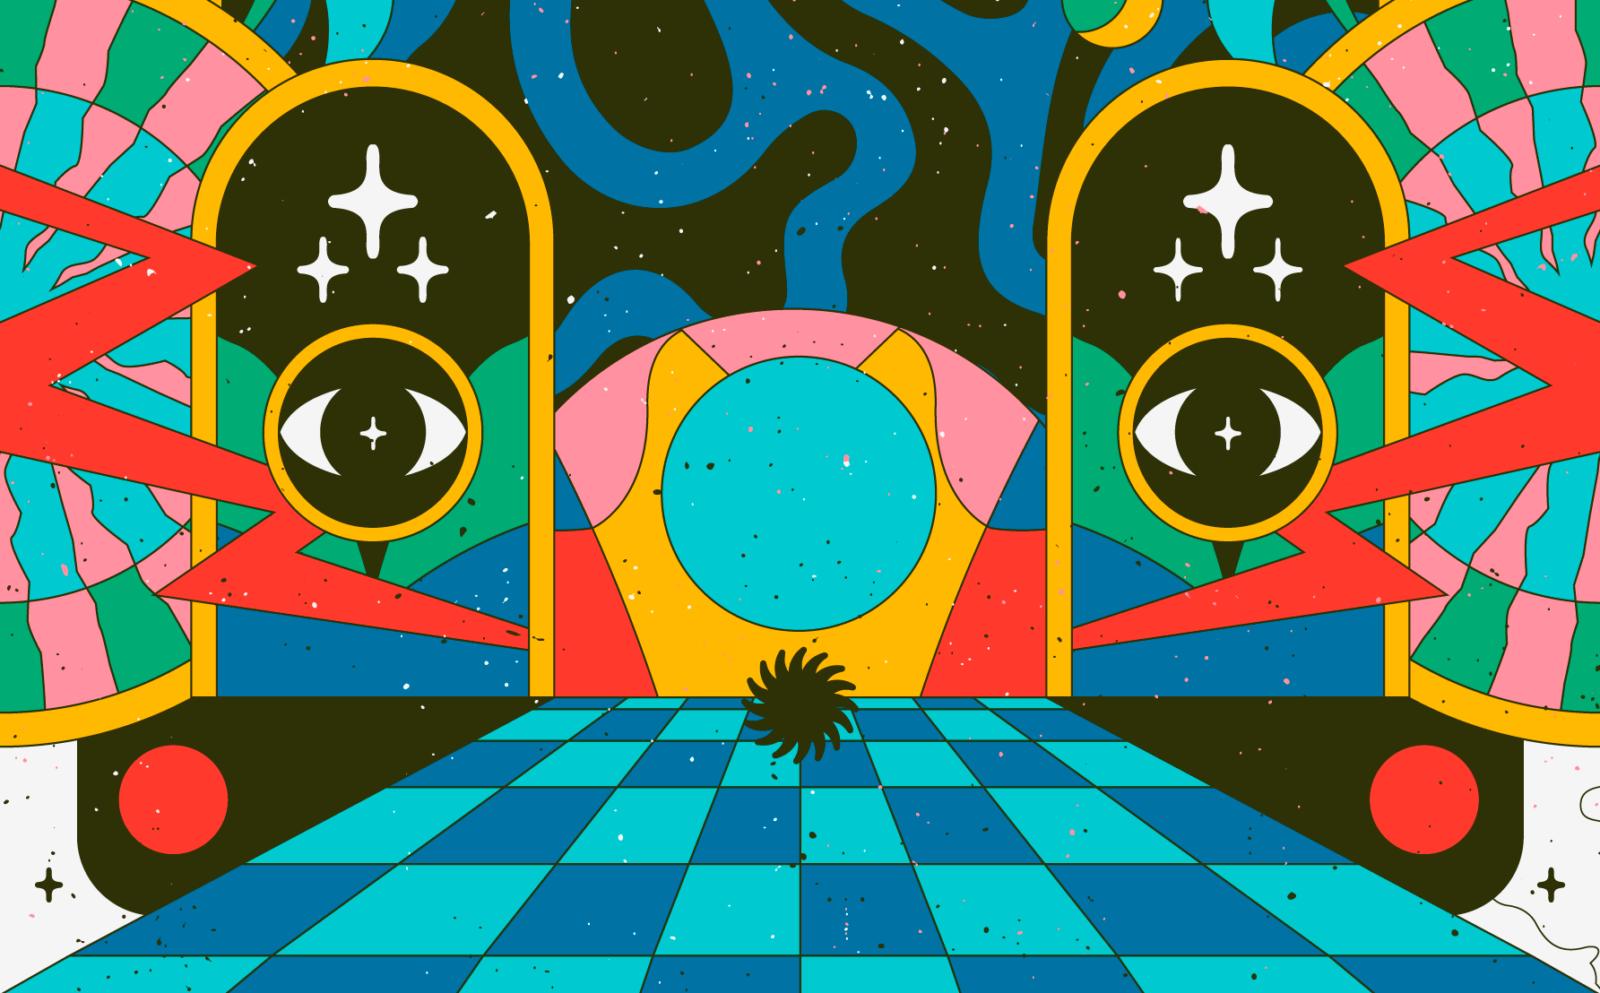 Derrière l'affiche : Les posters de festivals psychés de Blumoo